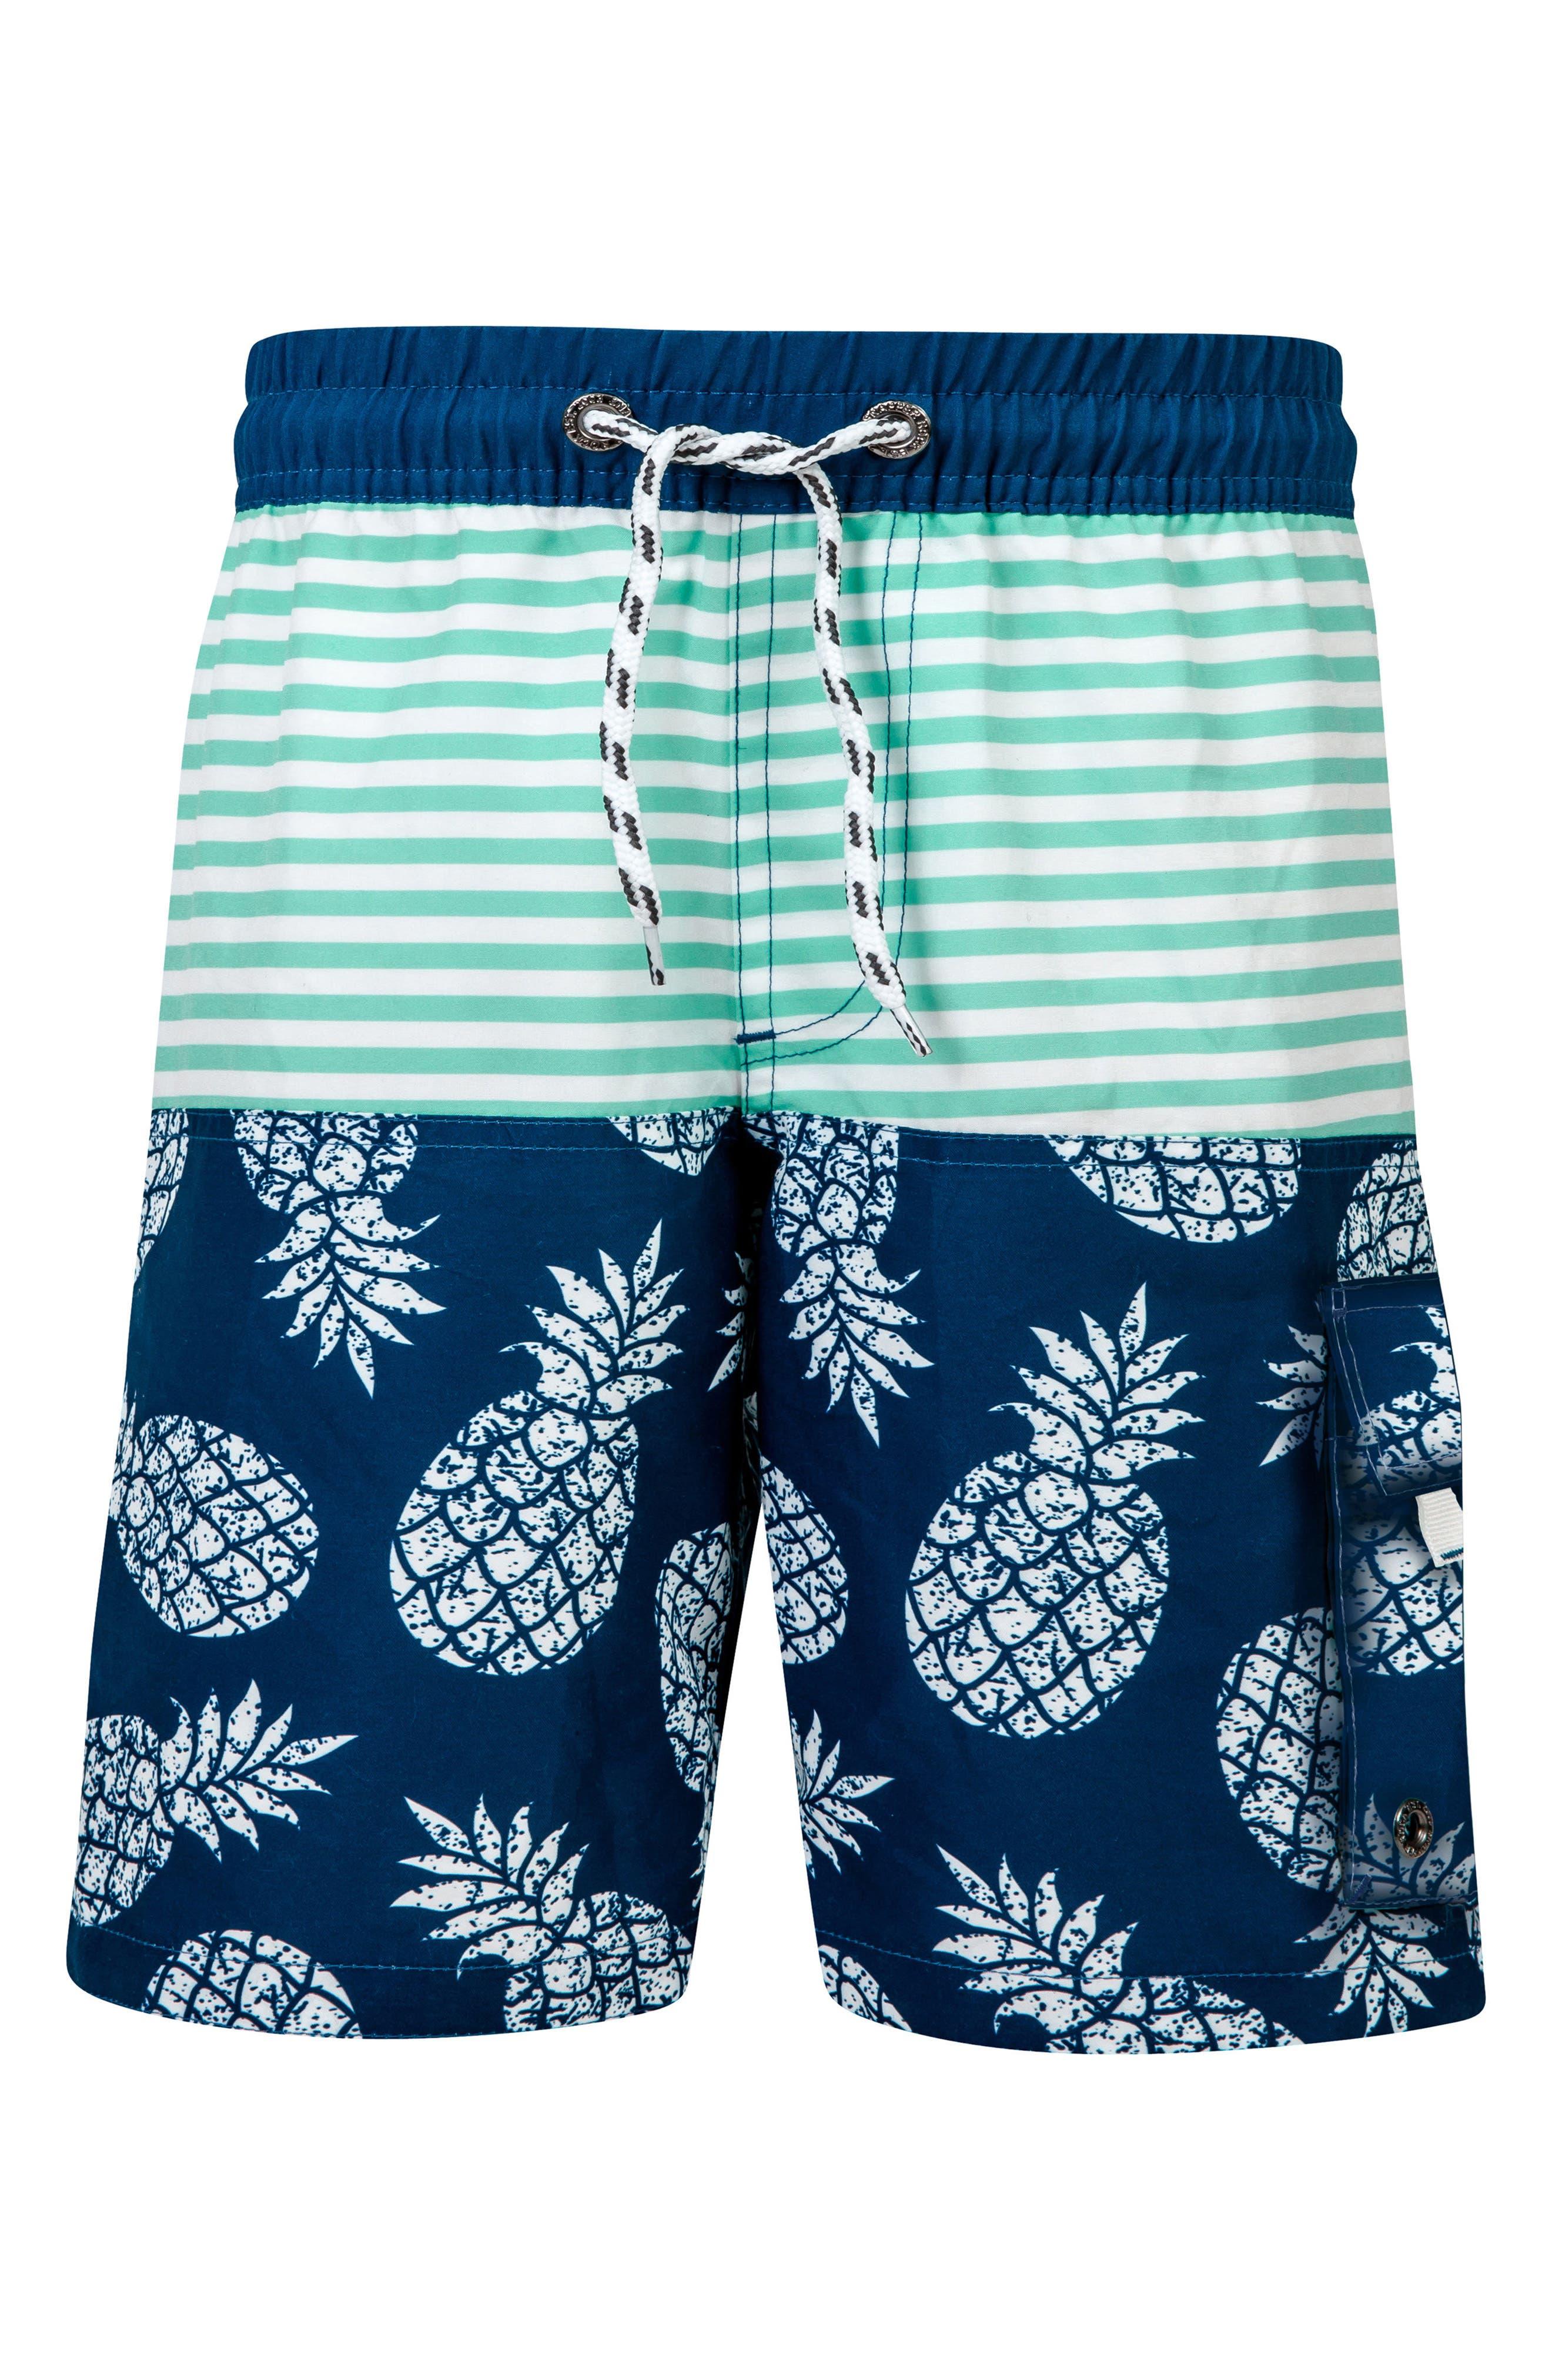 Pineapple Mint Stripe Board Shorts,                         Main,                         color, Denim/ Mint/ White